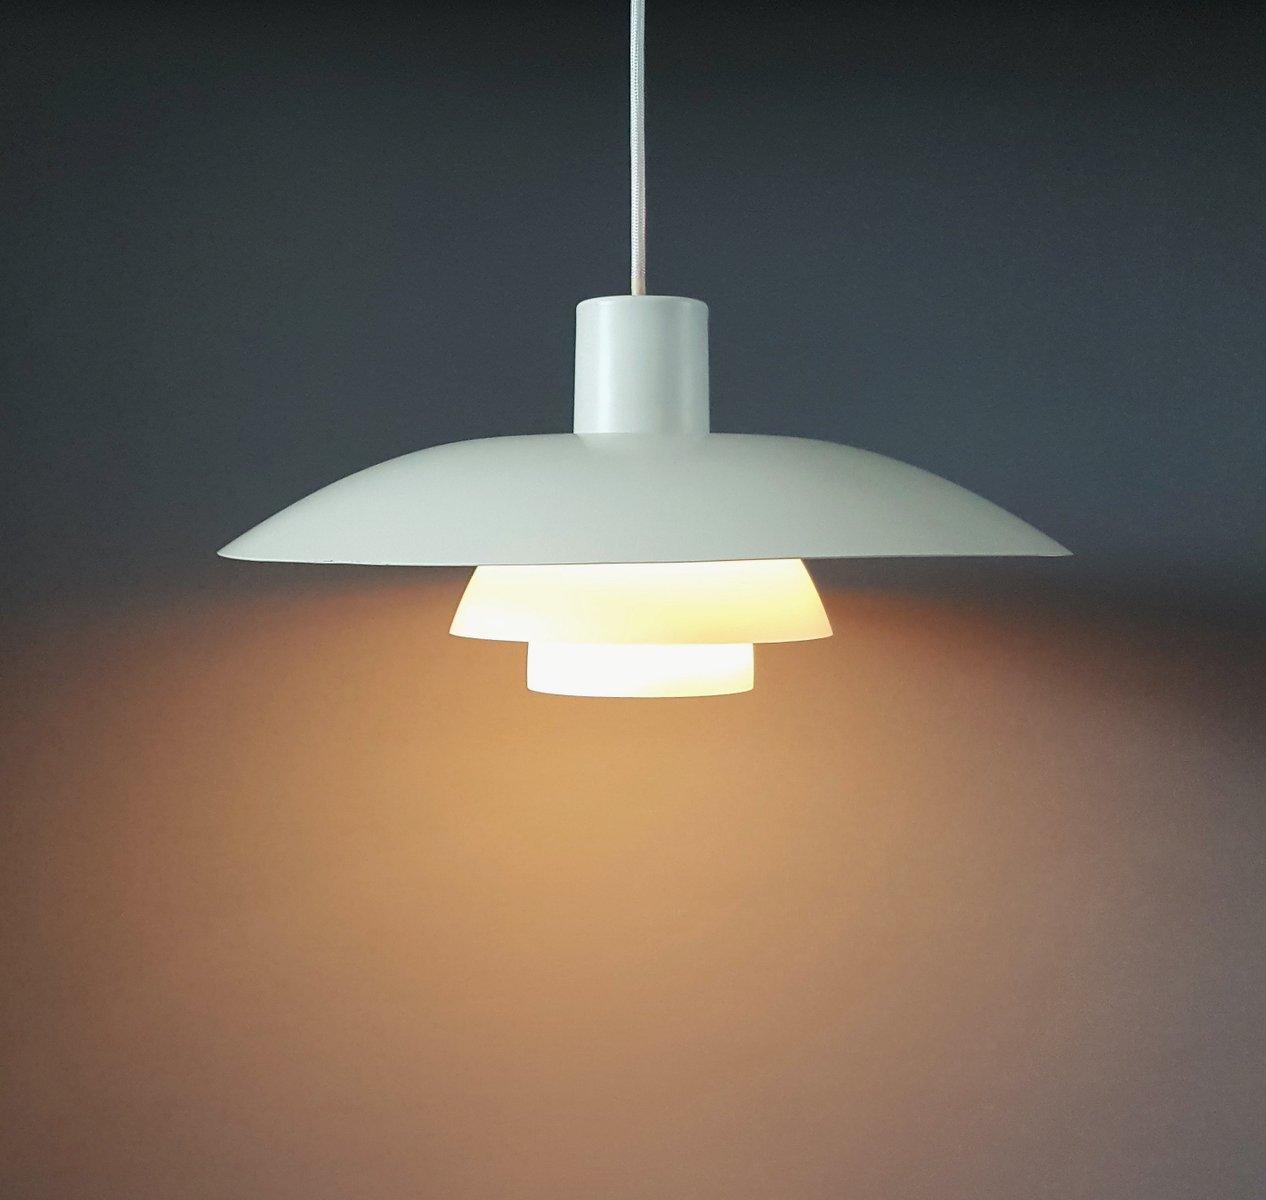 vintage white ph 4 3 pendant lamp by poul henningsen for. Black Bedroom Furniture Sets. Home Design Ideas